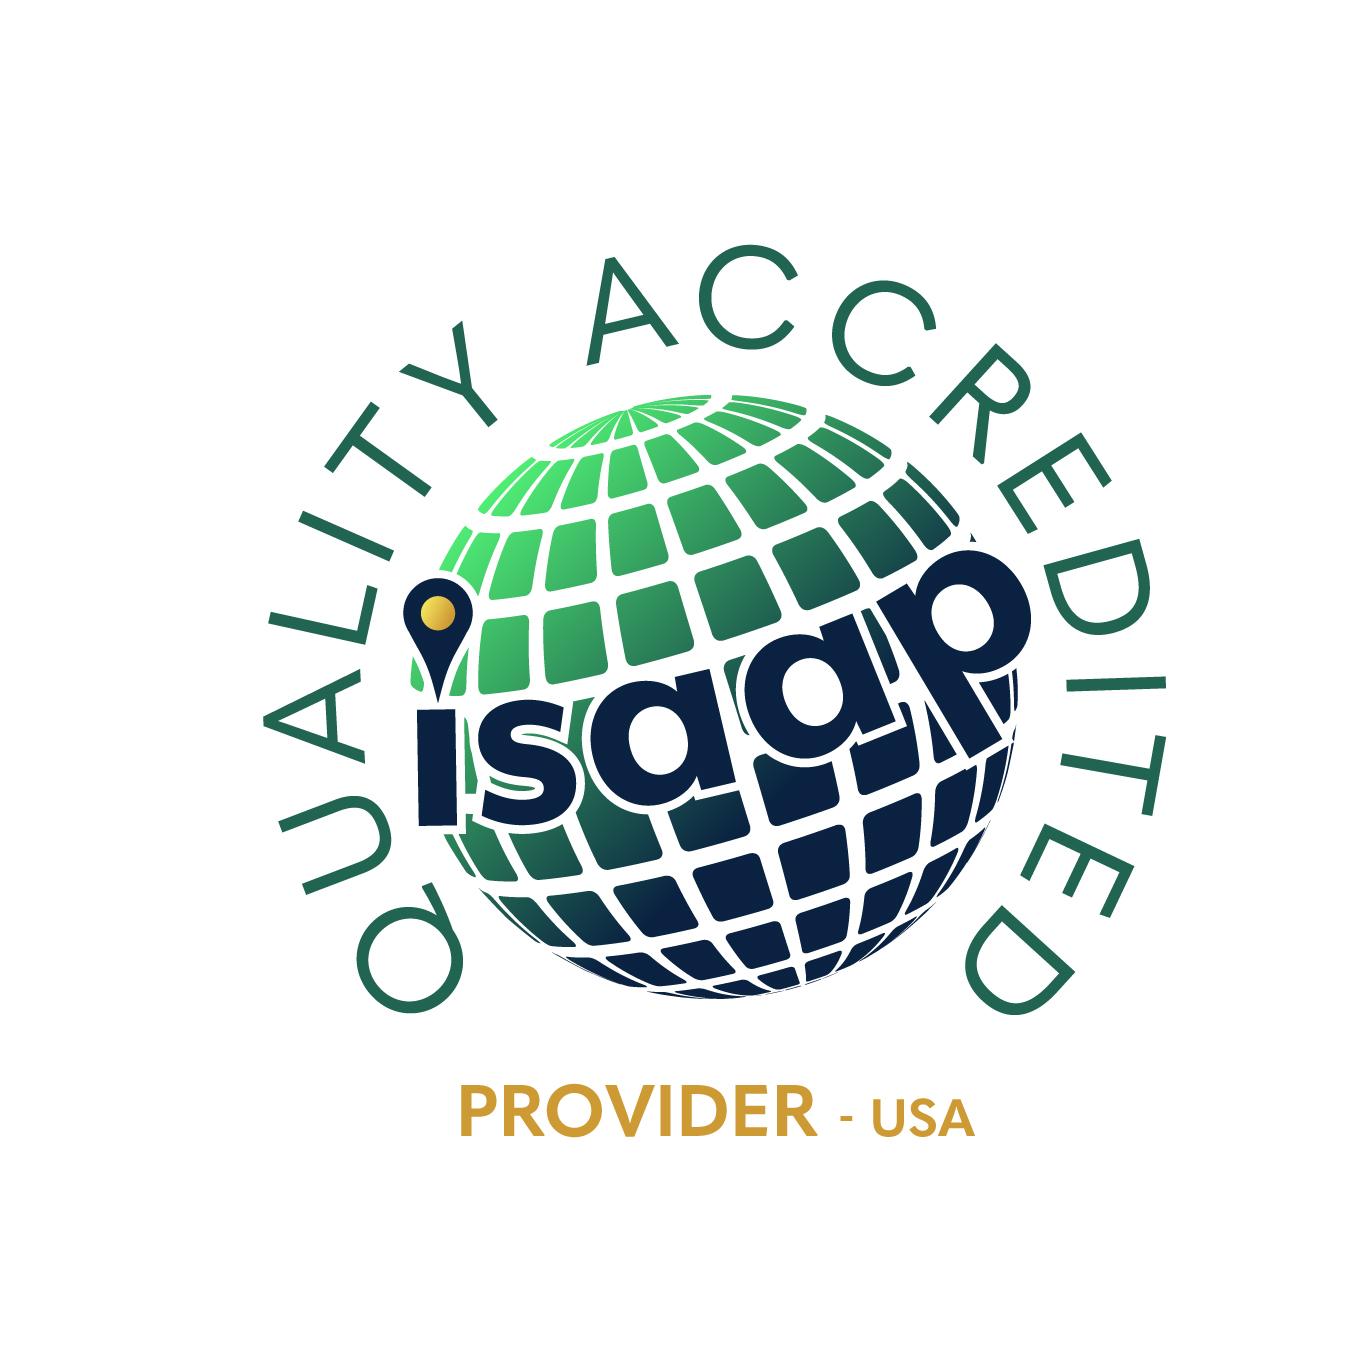 Murphy's Corporate Housing Associates, Inc. Awarded ASAP Quality Accreditation